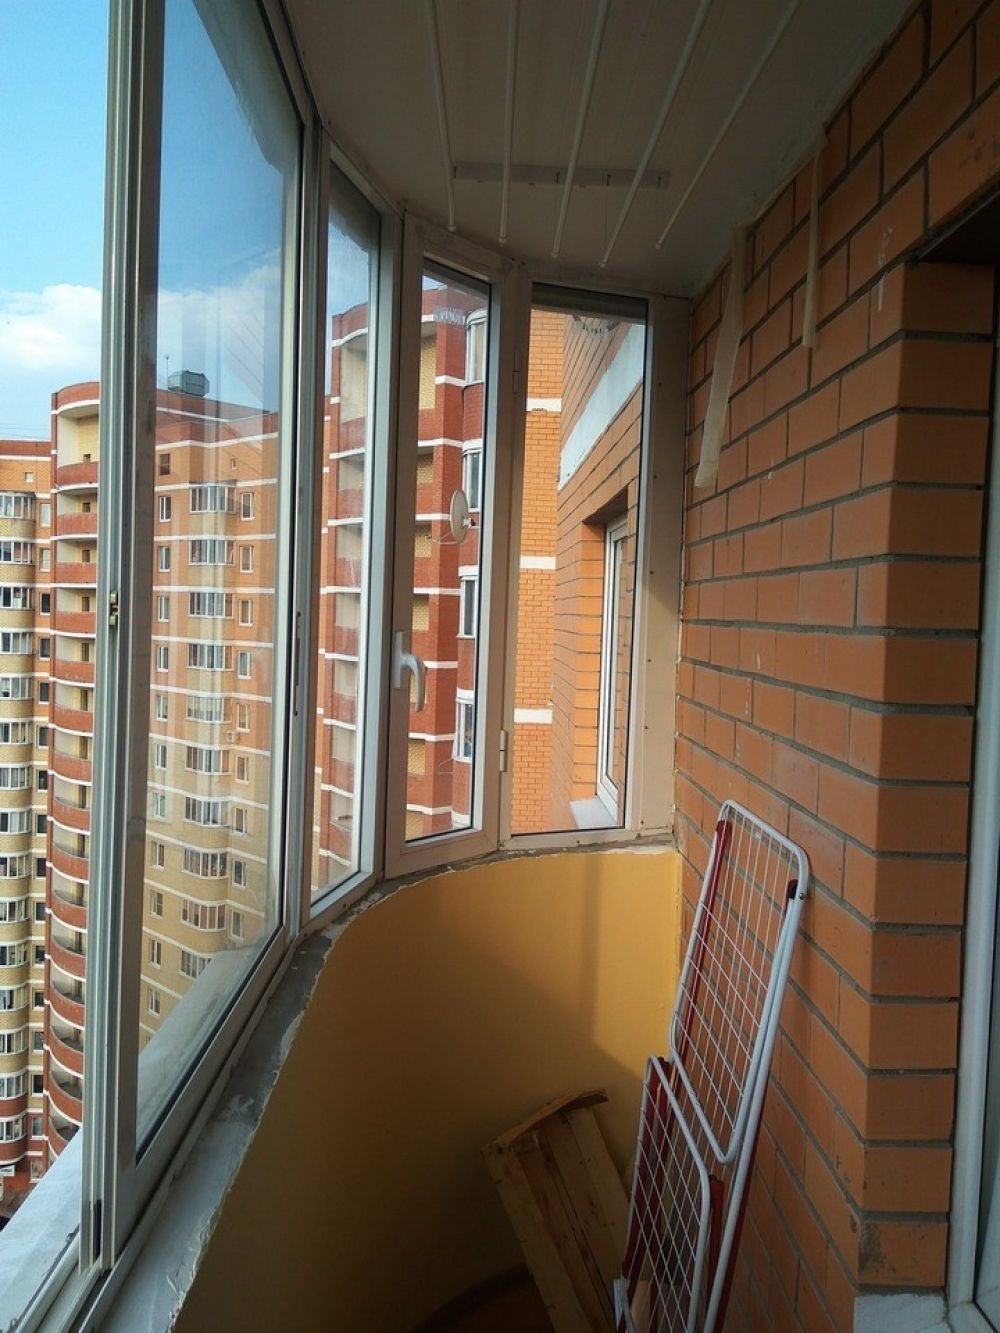 1-комнатная квартира 47.6 м2, г. Щелково, Богородский мкр,10, фото 12